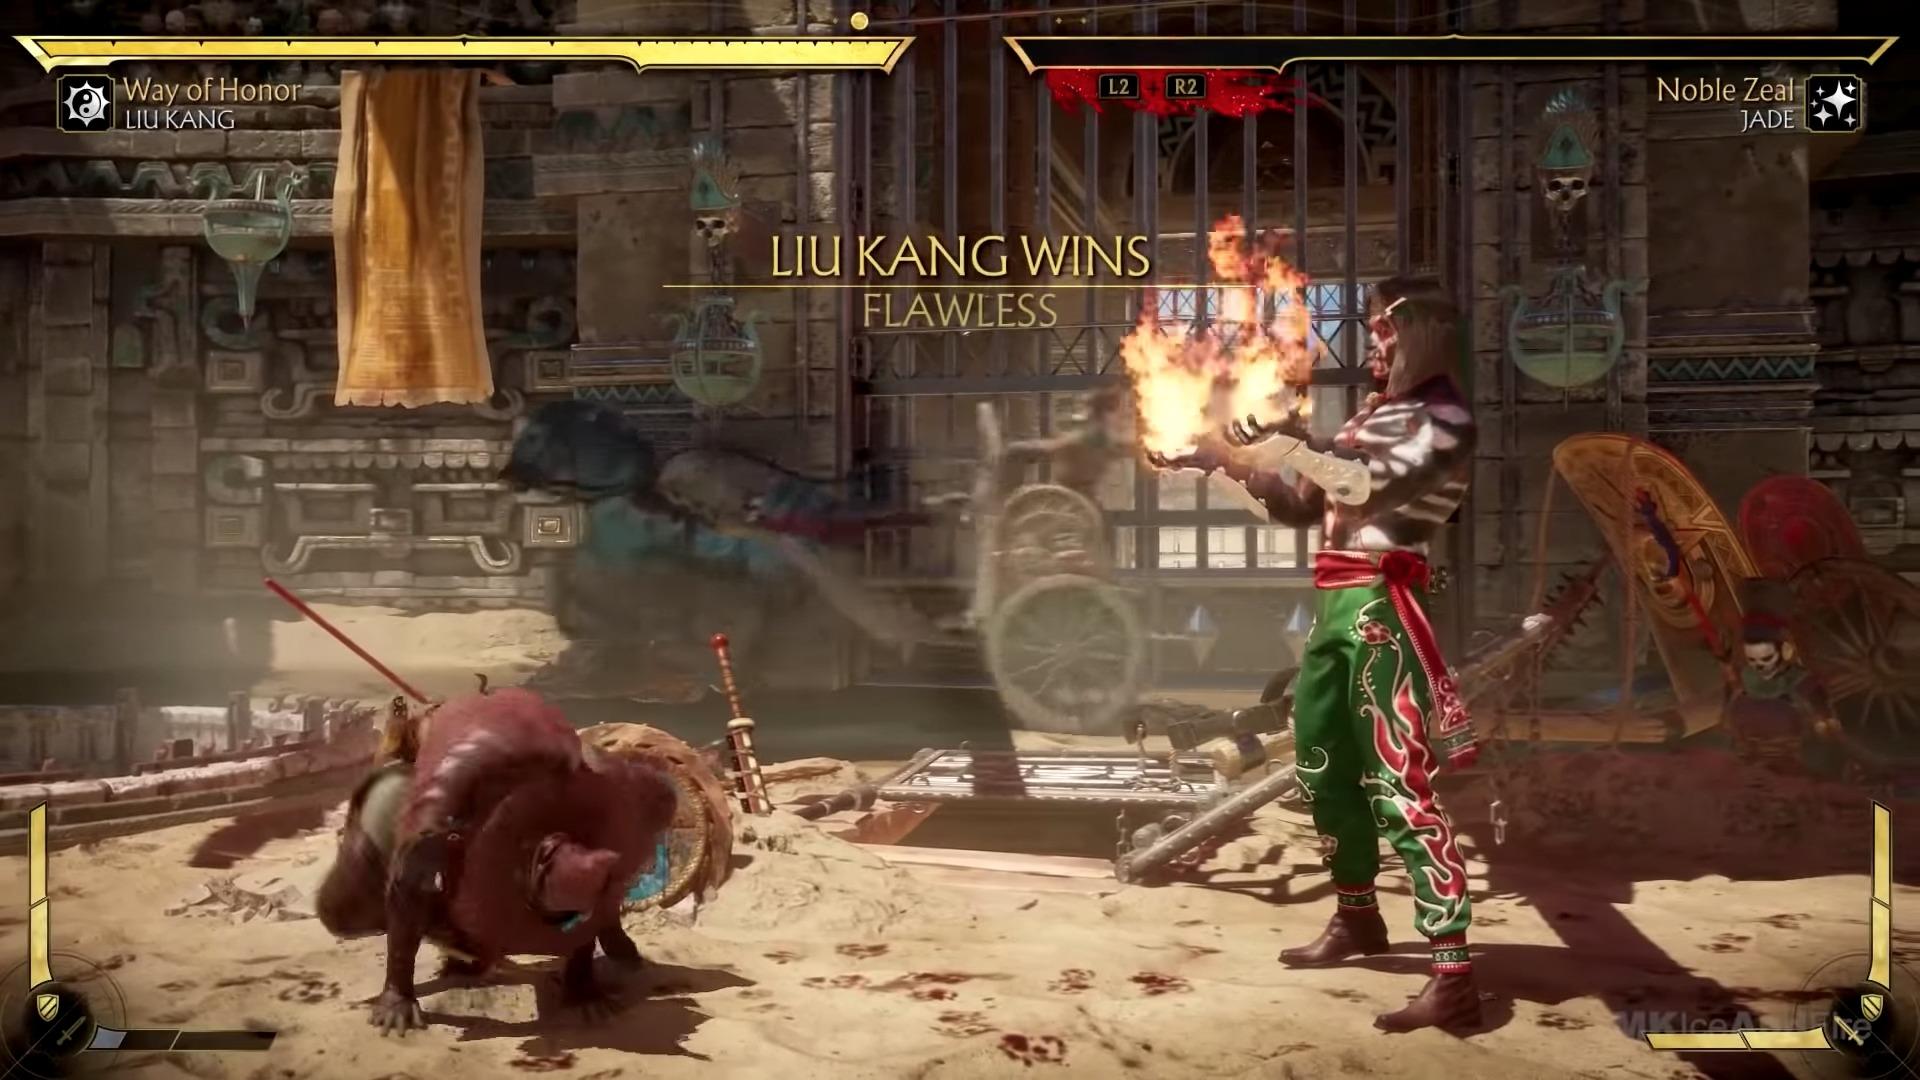 AT&T Mortal Kombat 11 Warner